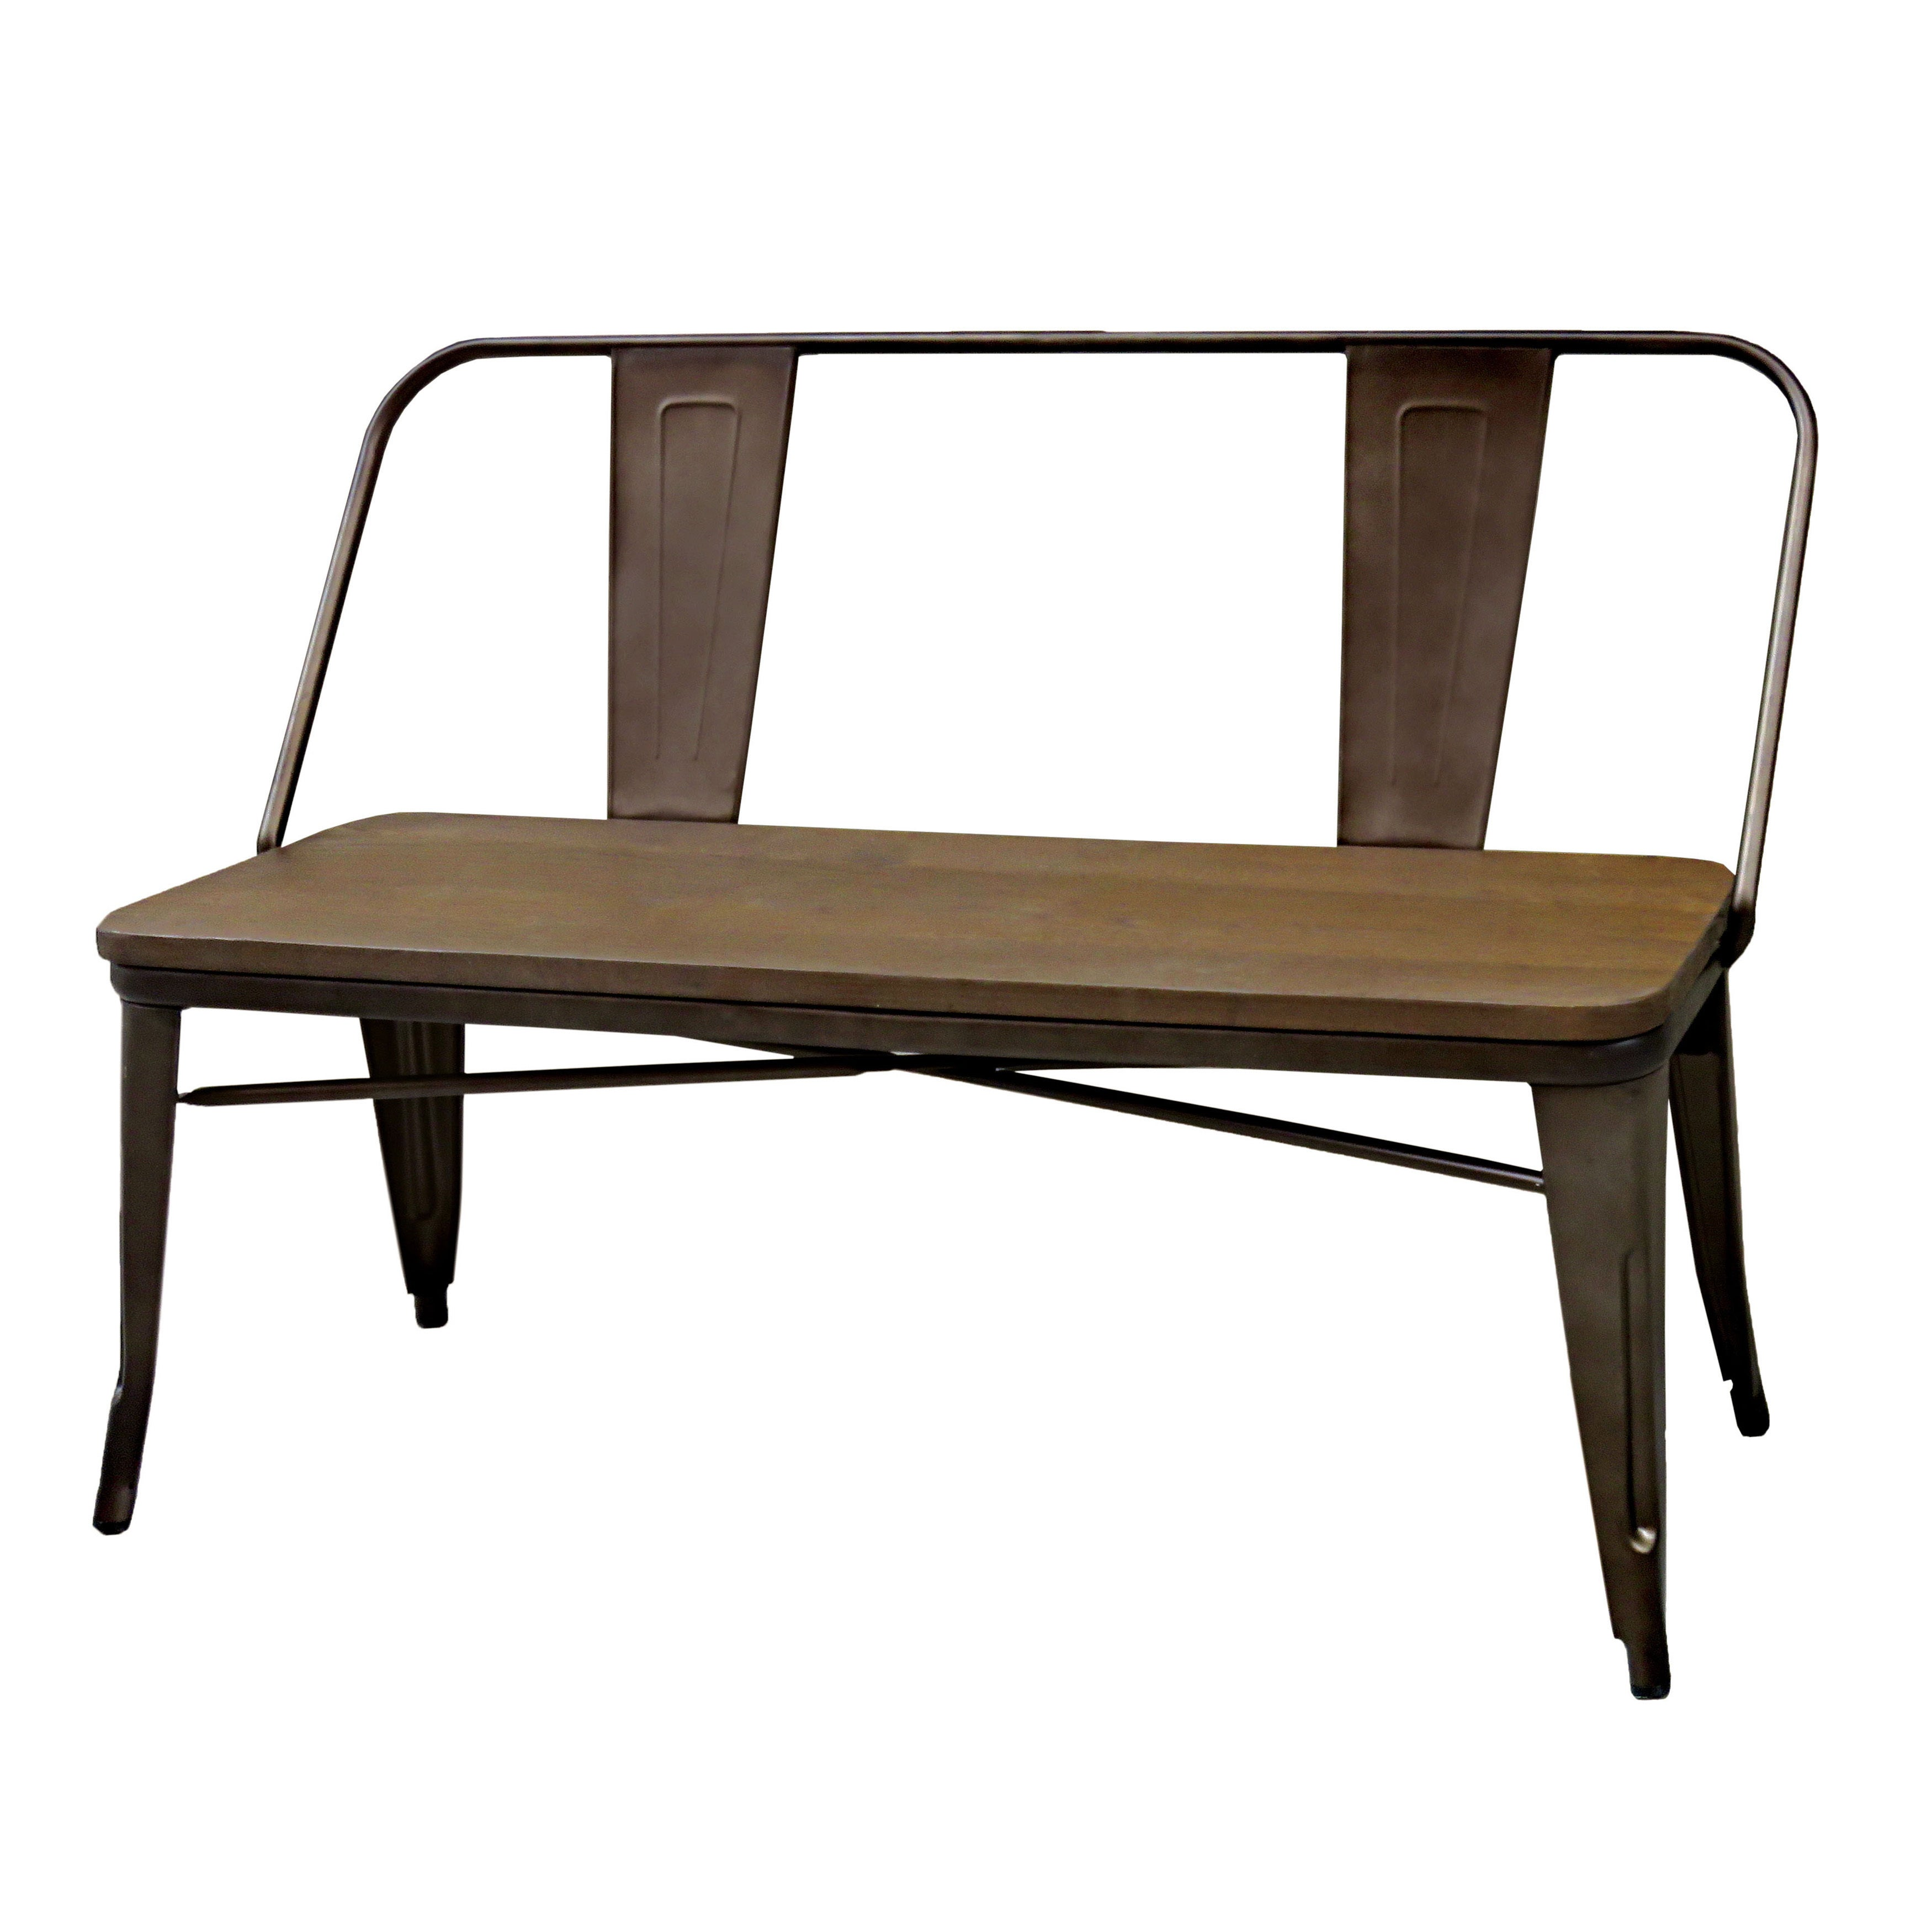 Furniture Of America Tripton Industrial Metal Natural Elm Dining Bench